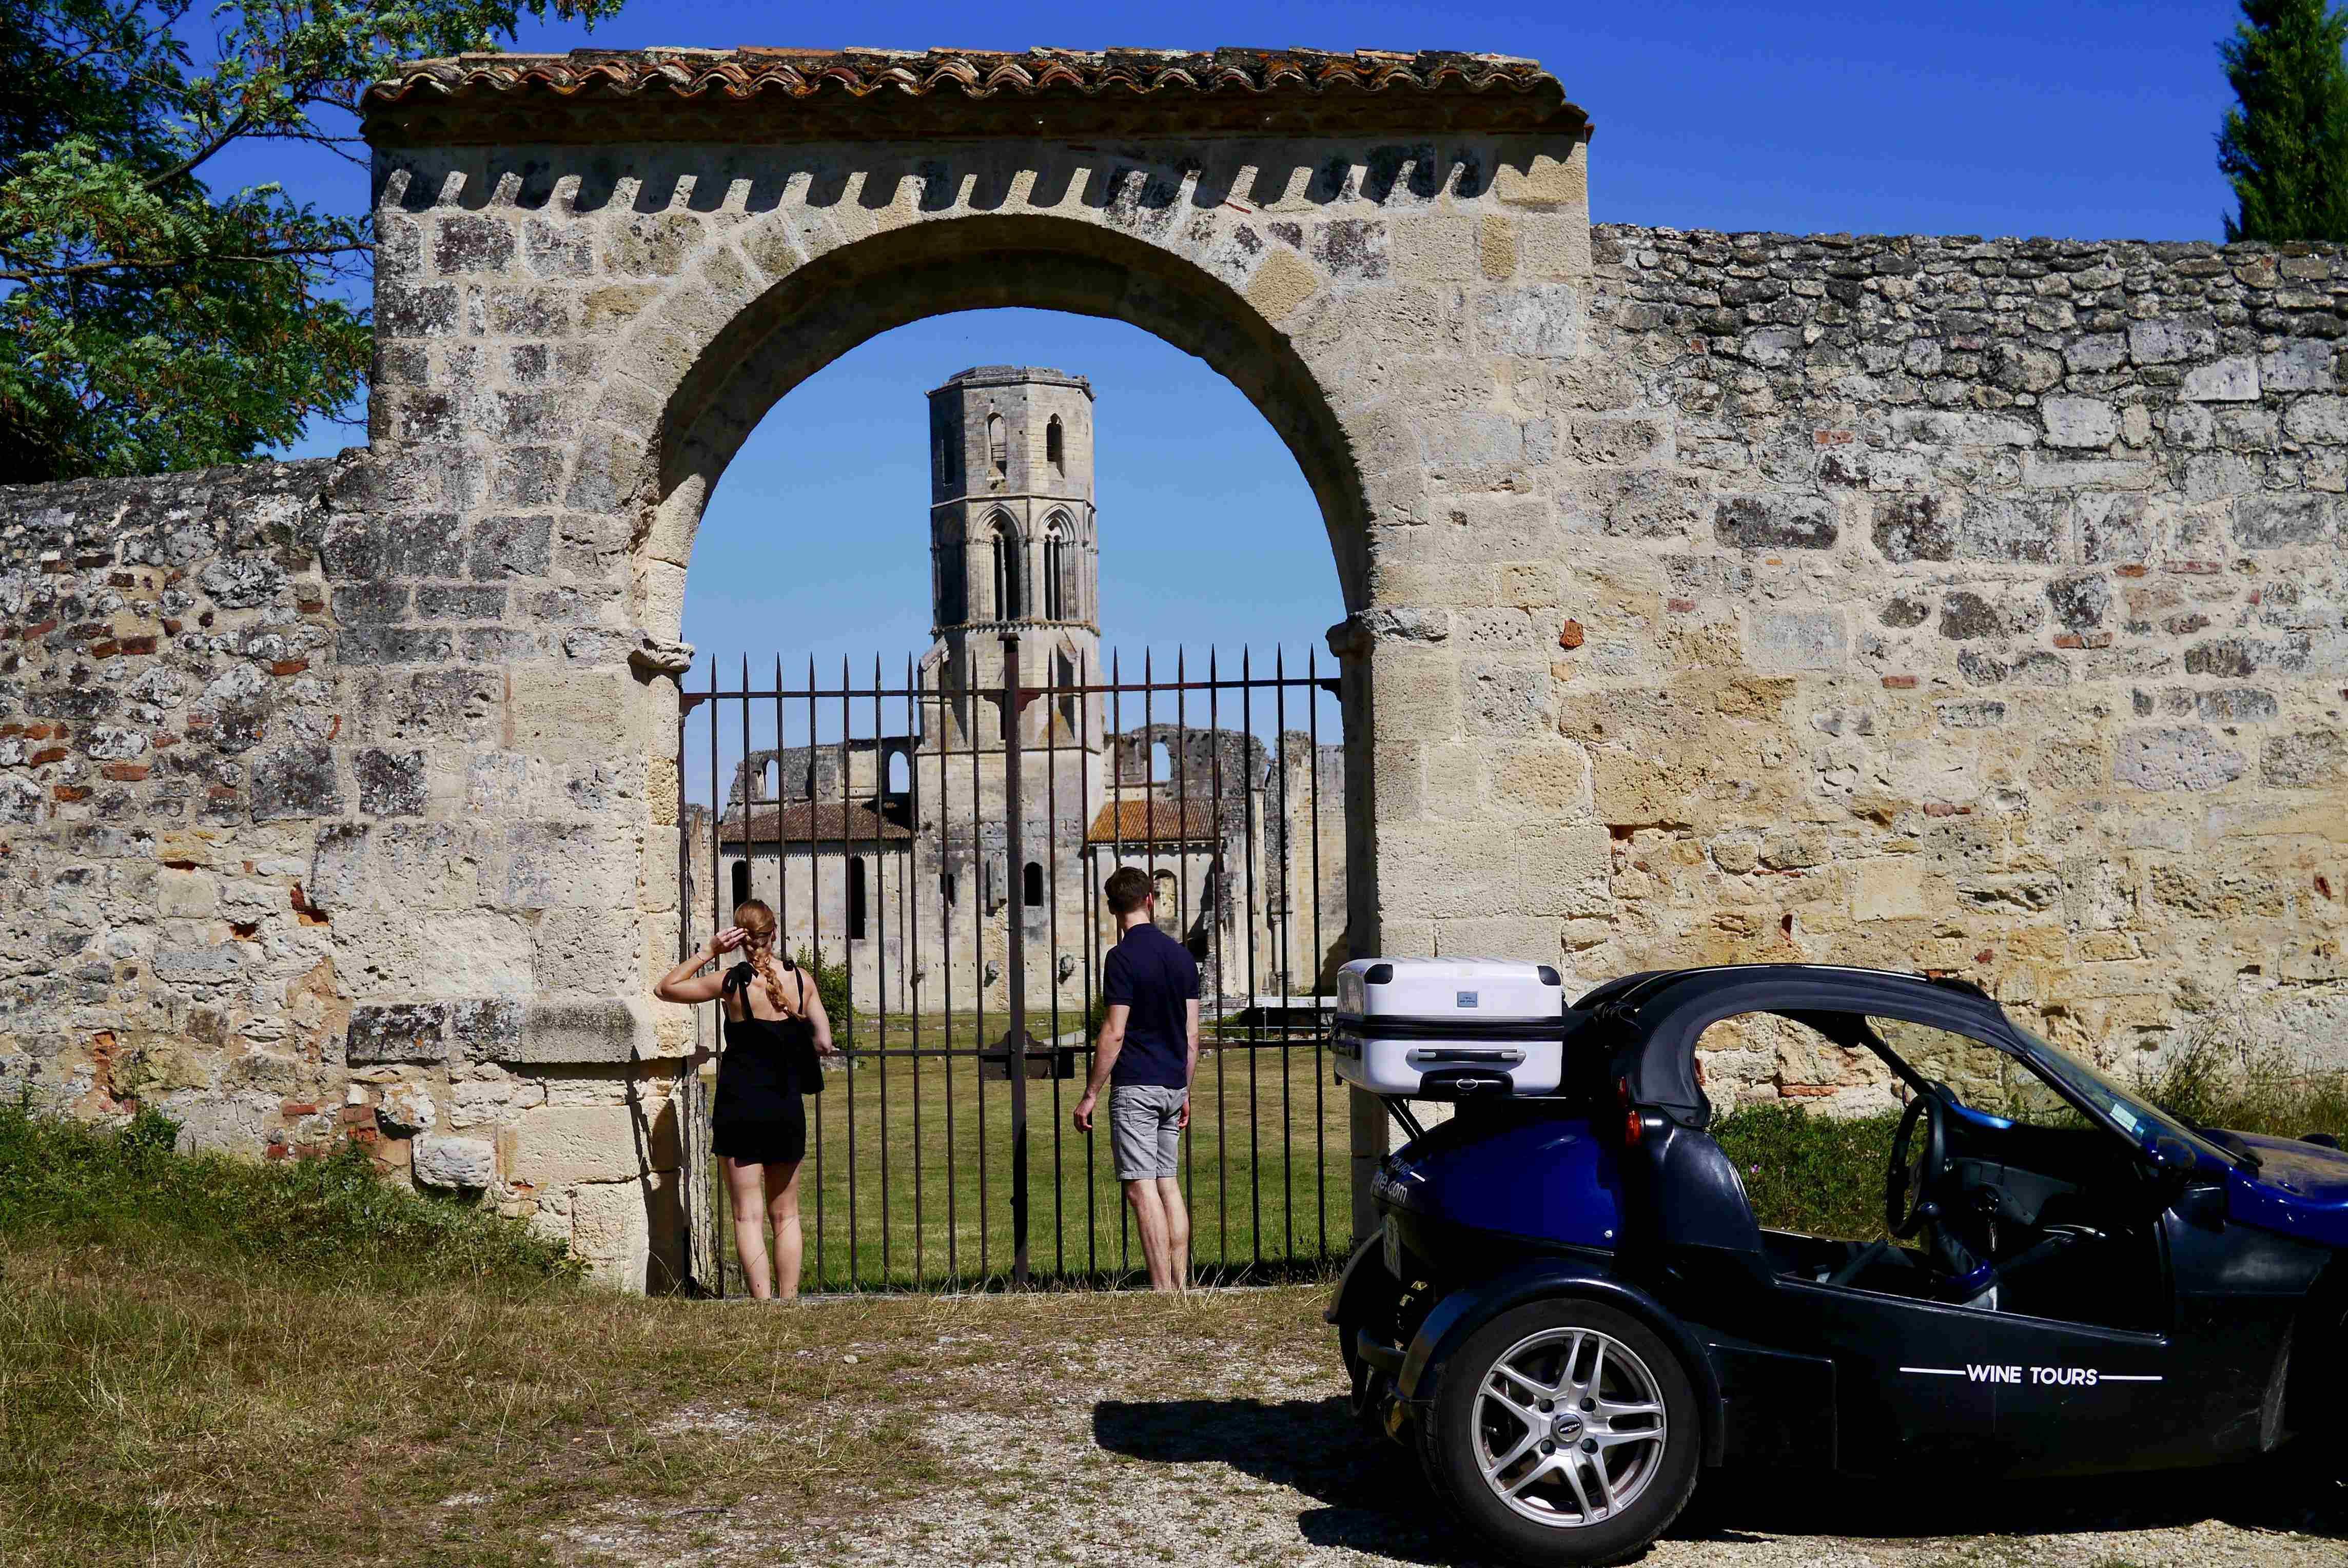 A day in Saint-Emilion – 9h